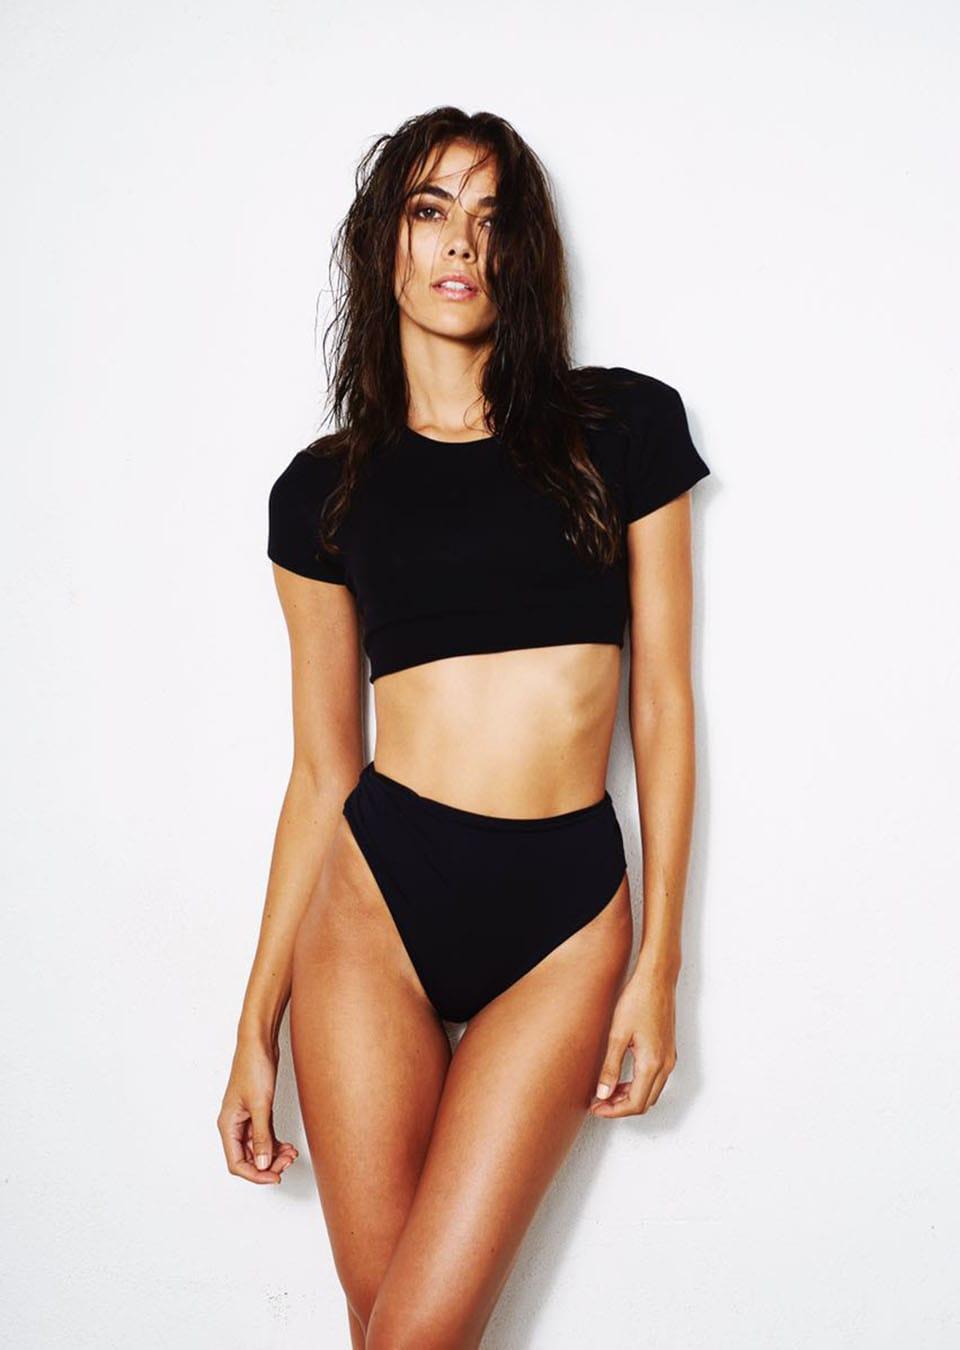 Pics Marly Velasquez naked (37 photos), Sexy, Hot, Boobs, in bikini 2017